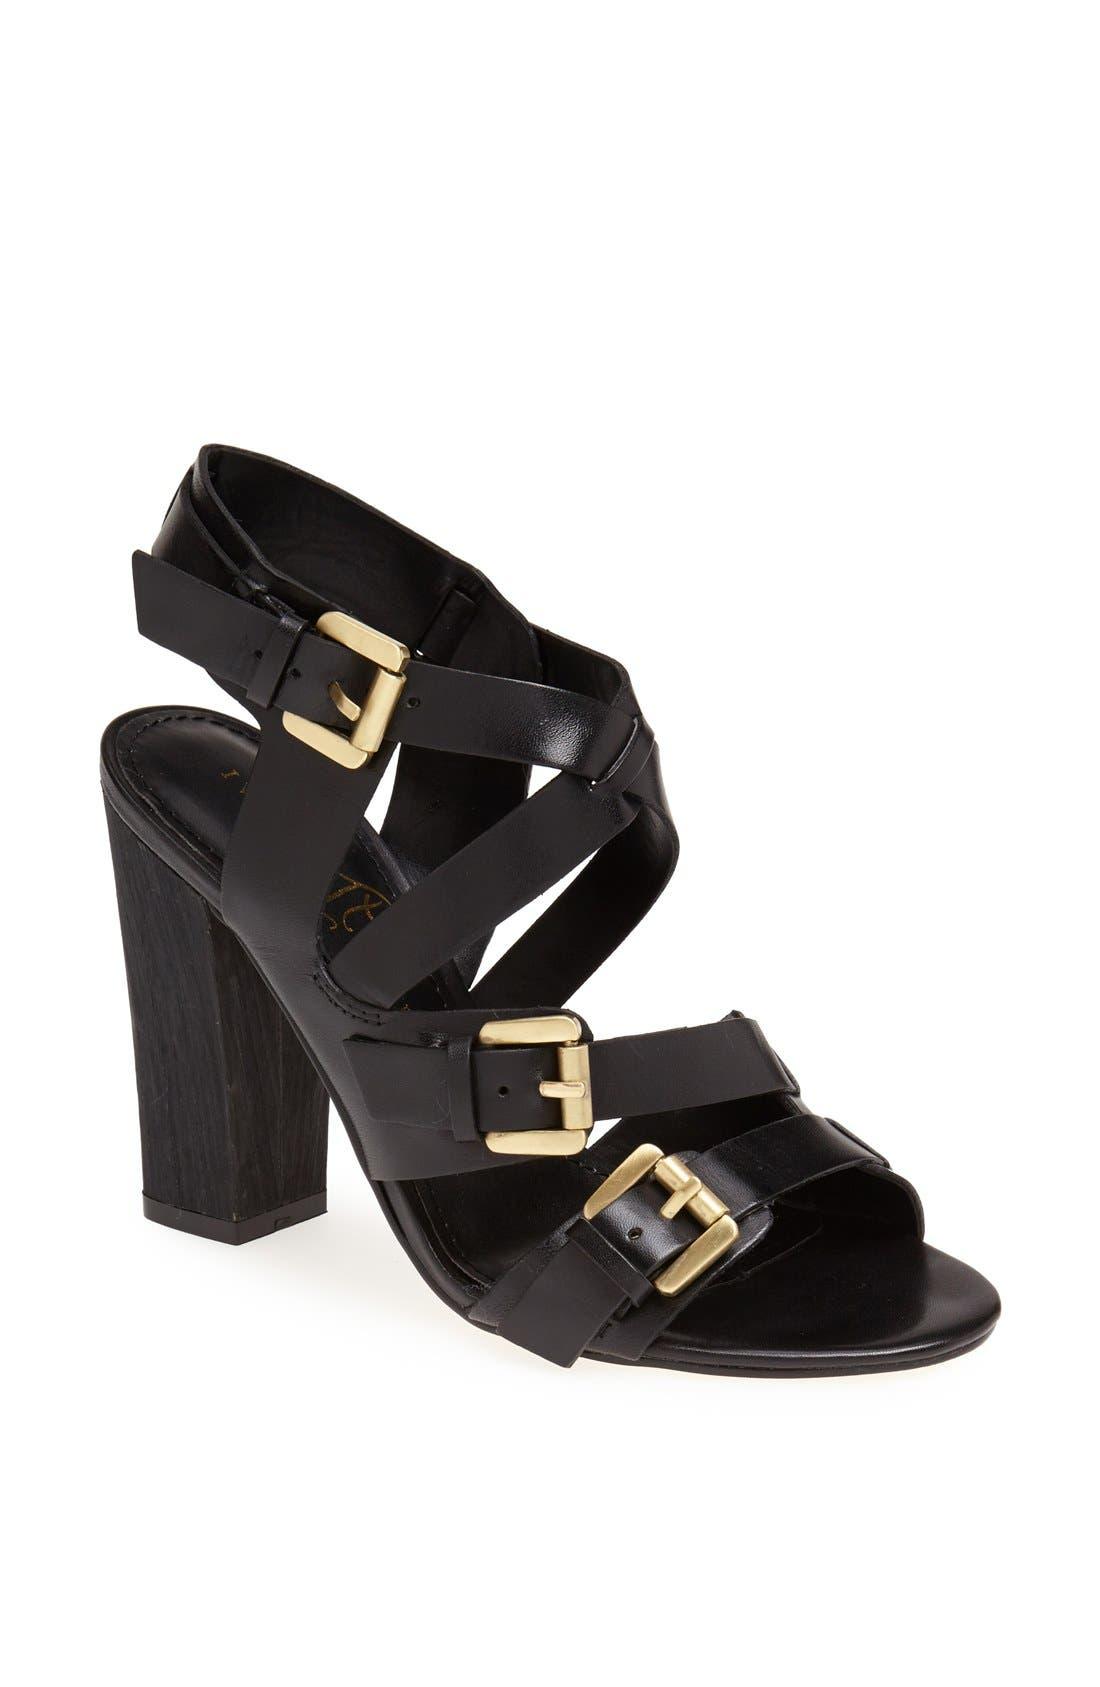 Main Image - Ivanka Trump 'Berni' Sandal